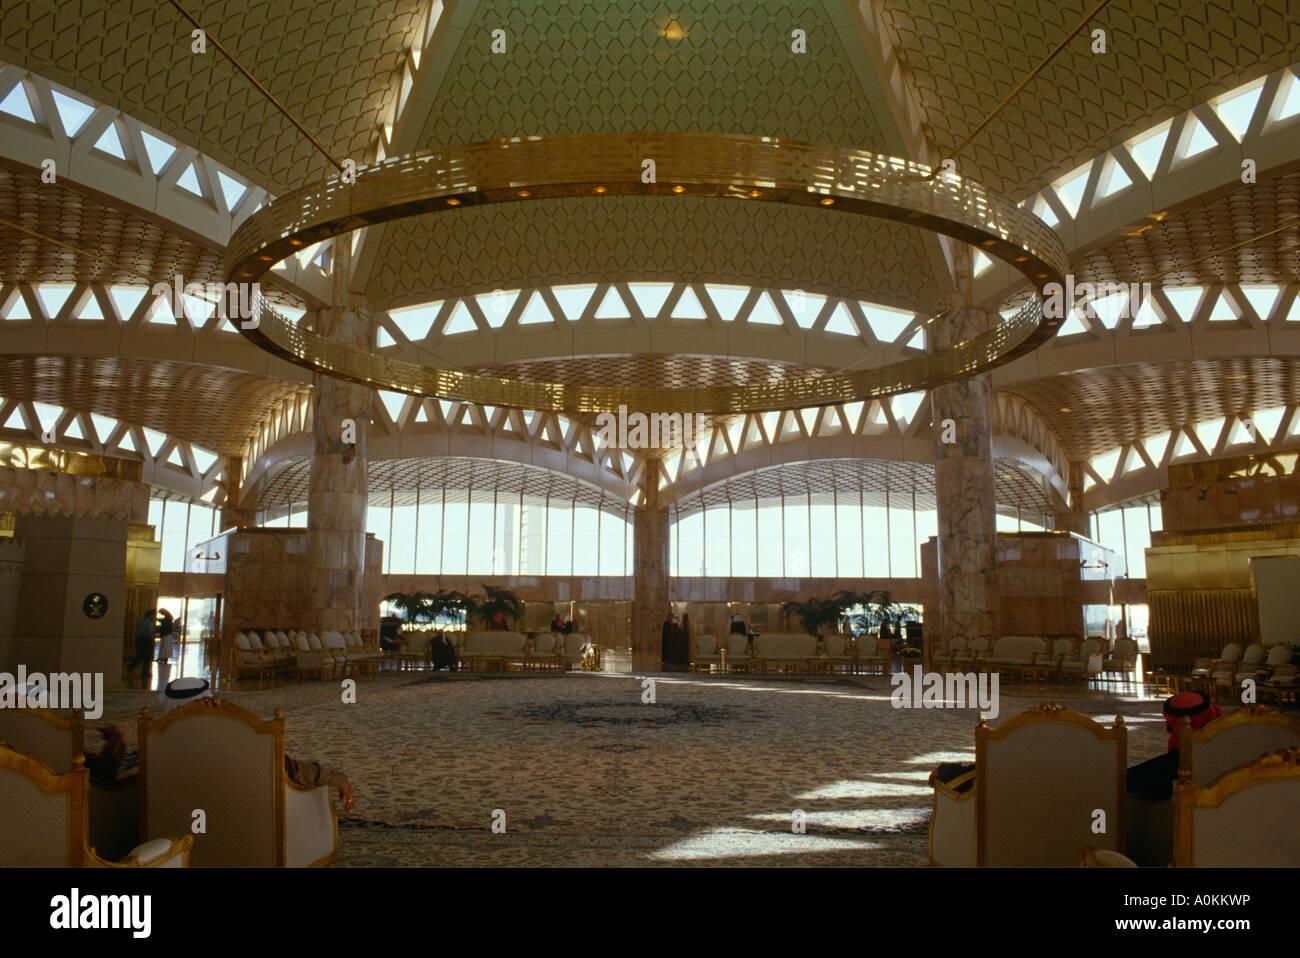 King Khalid Airport in Riyadh, Saudi Arabia - Stock Image